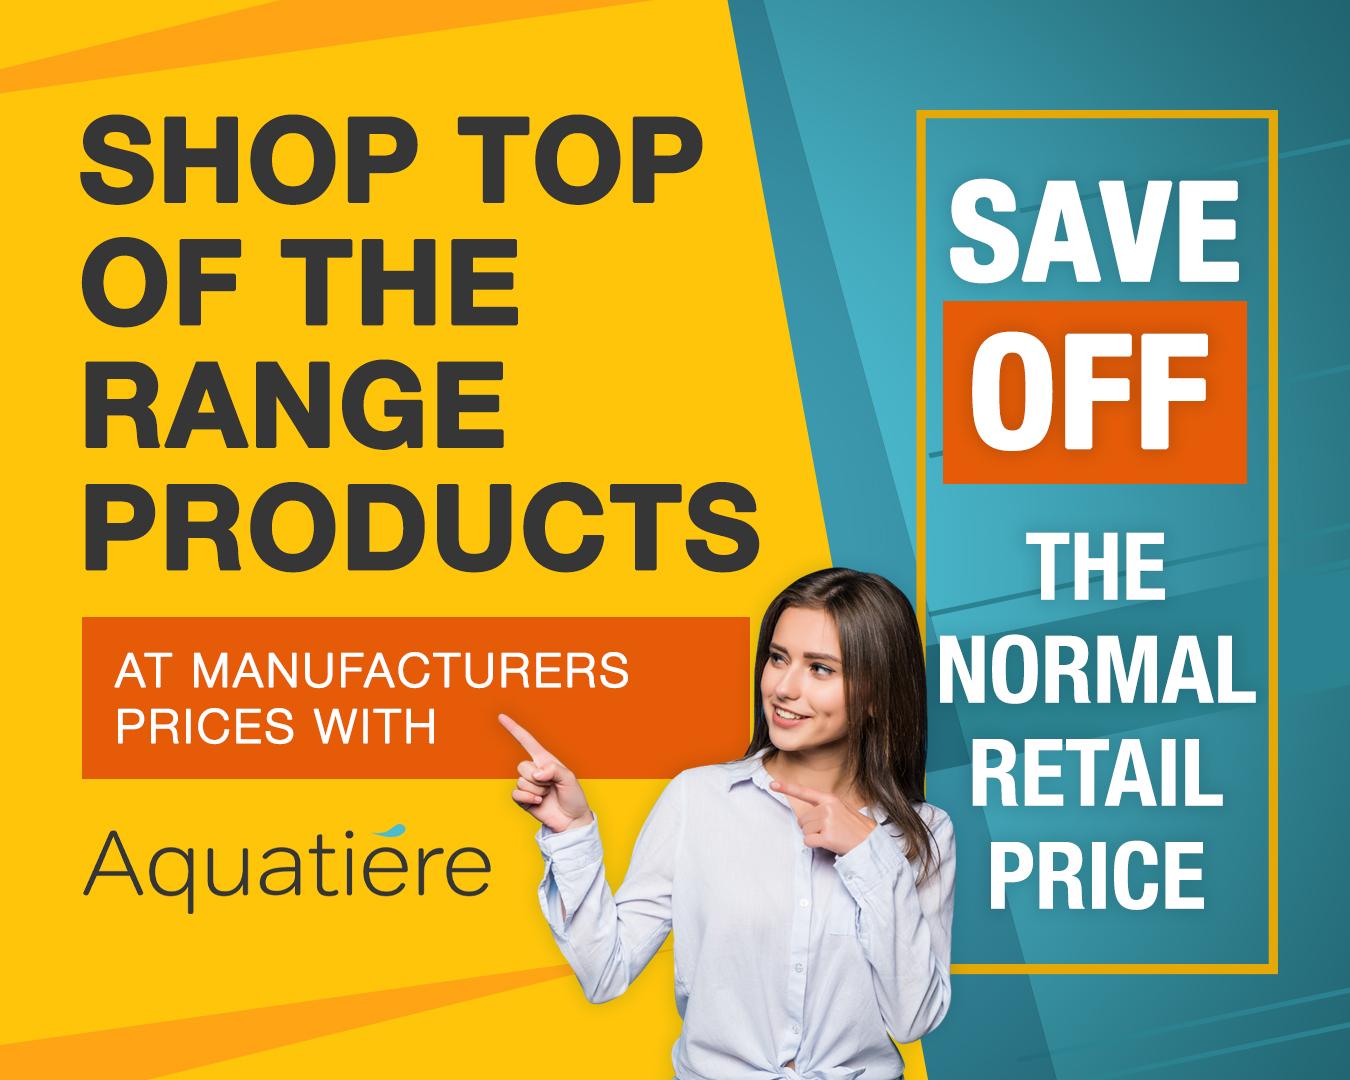 Aquatiere Retail Price Sale